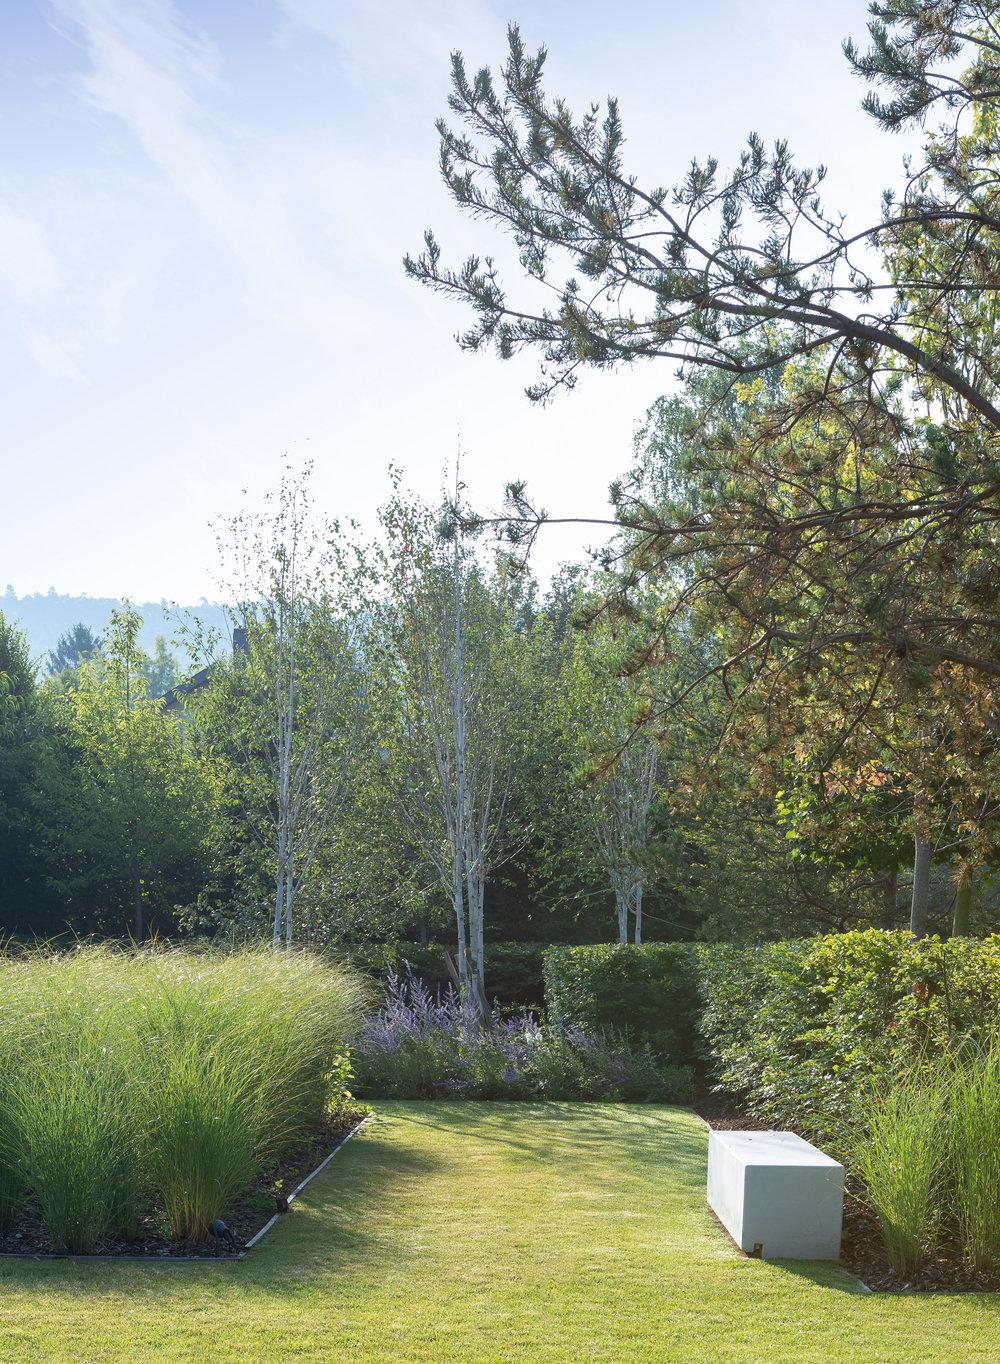 jardin_luxembourg_terrasses_jardins_outdoor_garden_christophe_gautrand_paysagiste_5.jpg